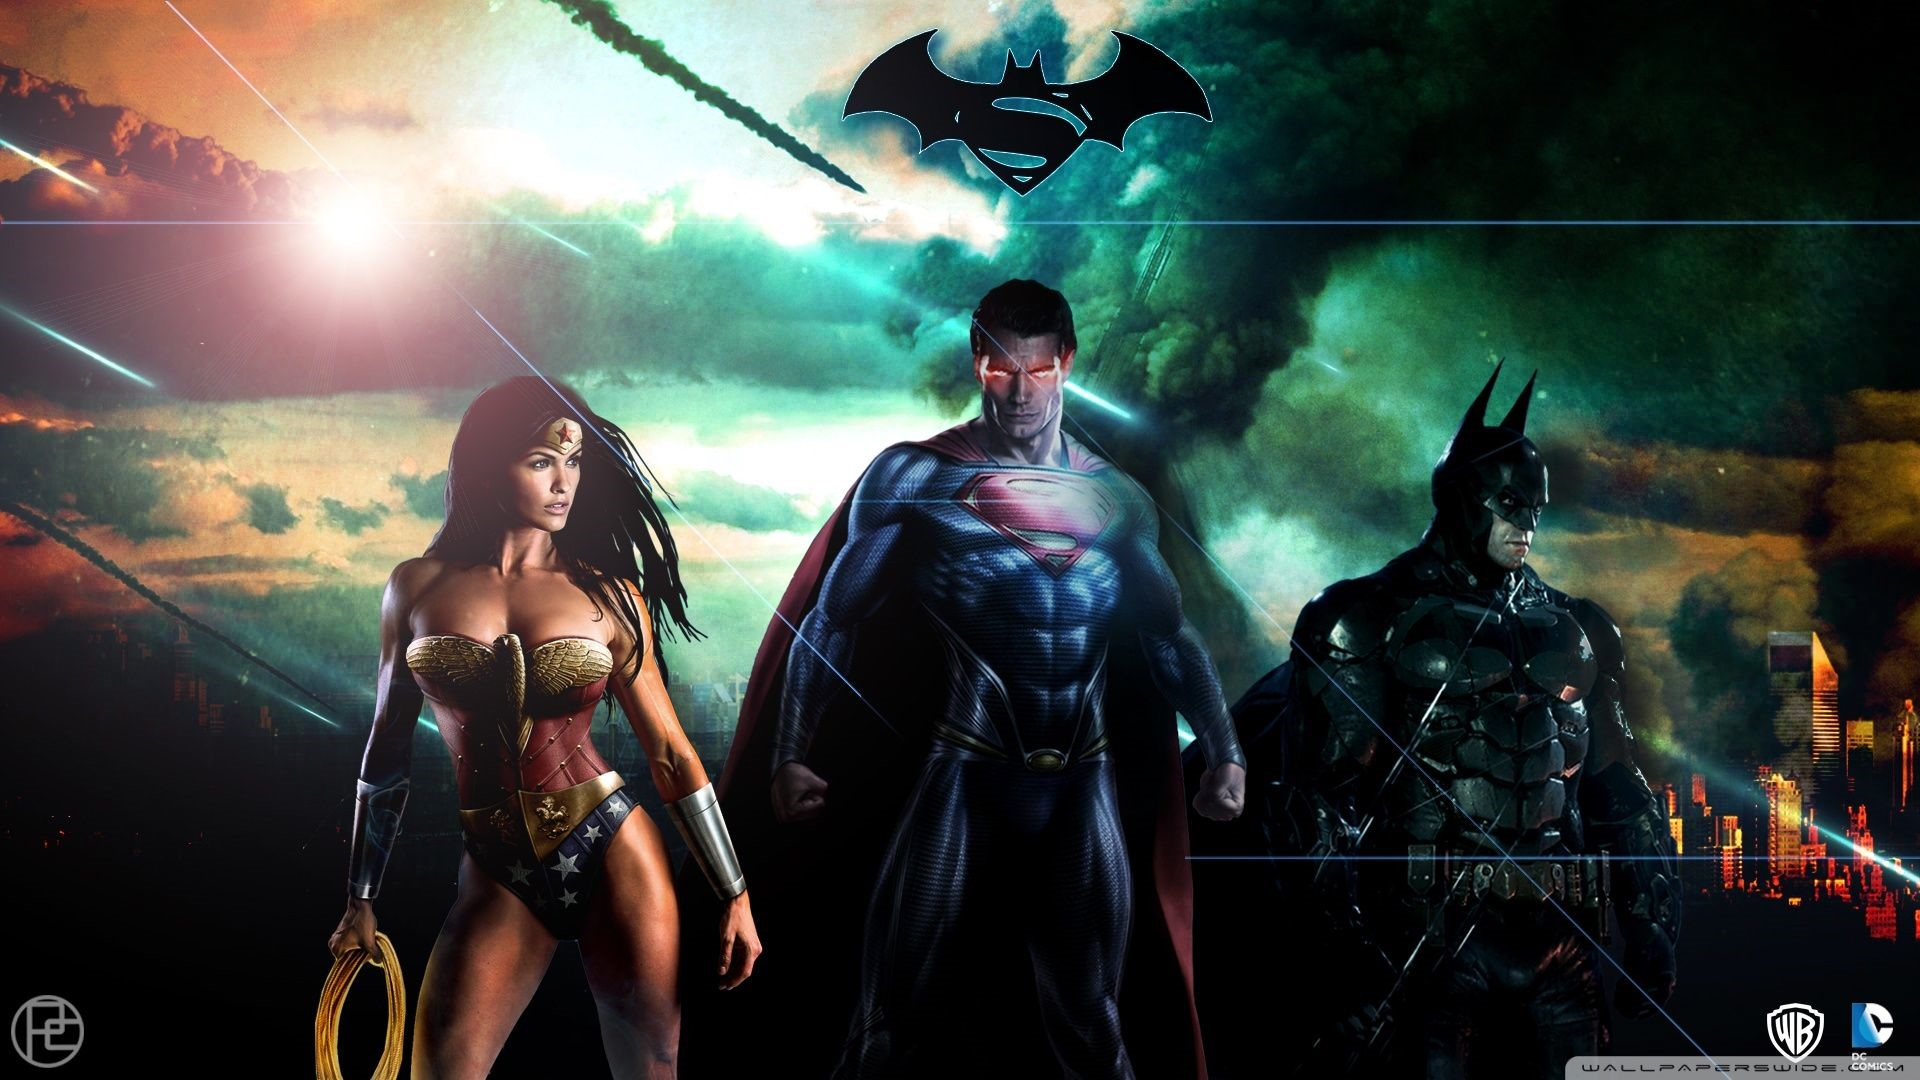 Superman Game Phone Wallpapers